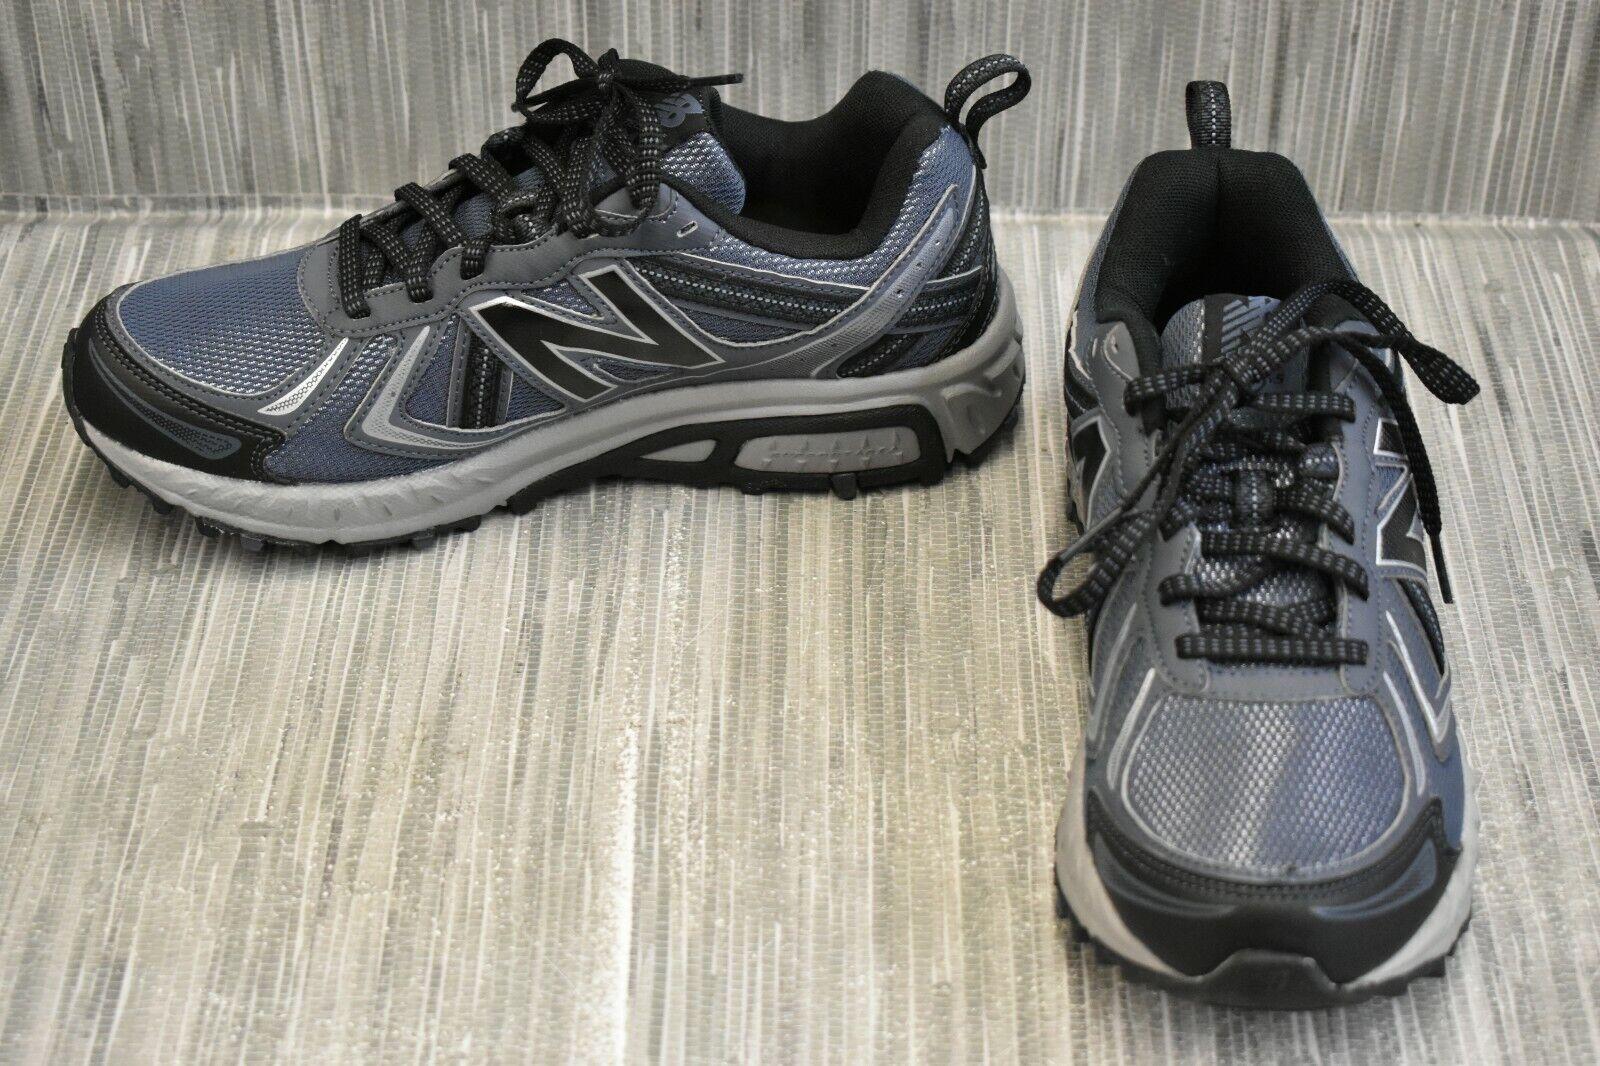 New Balance 410v5 MT410LT5 Trail Running Shoes, Men's Size 8